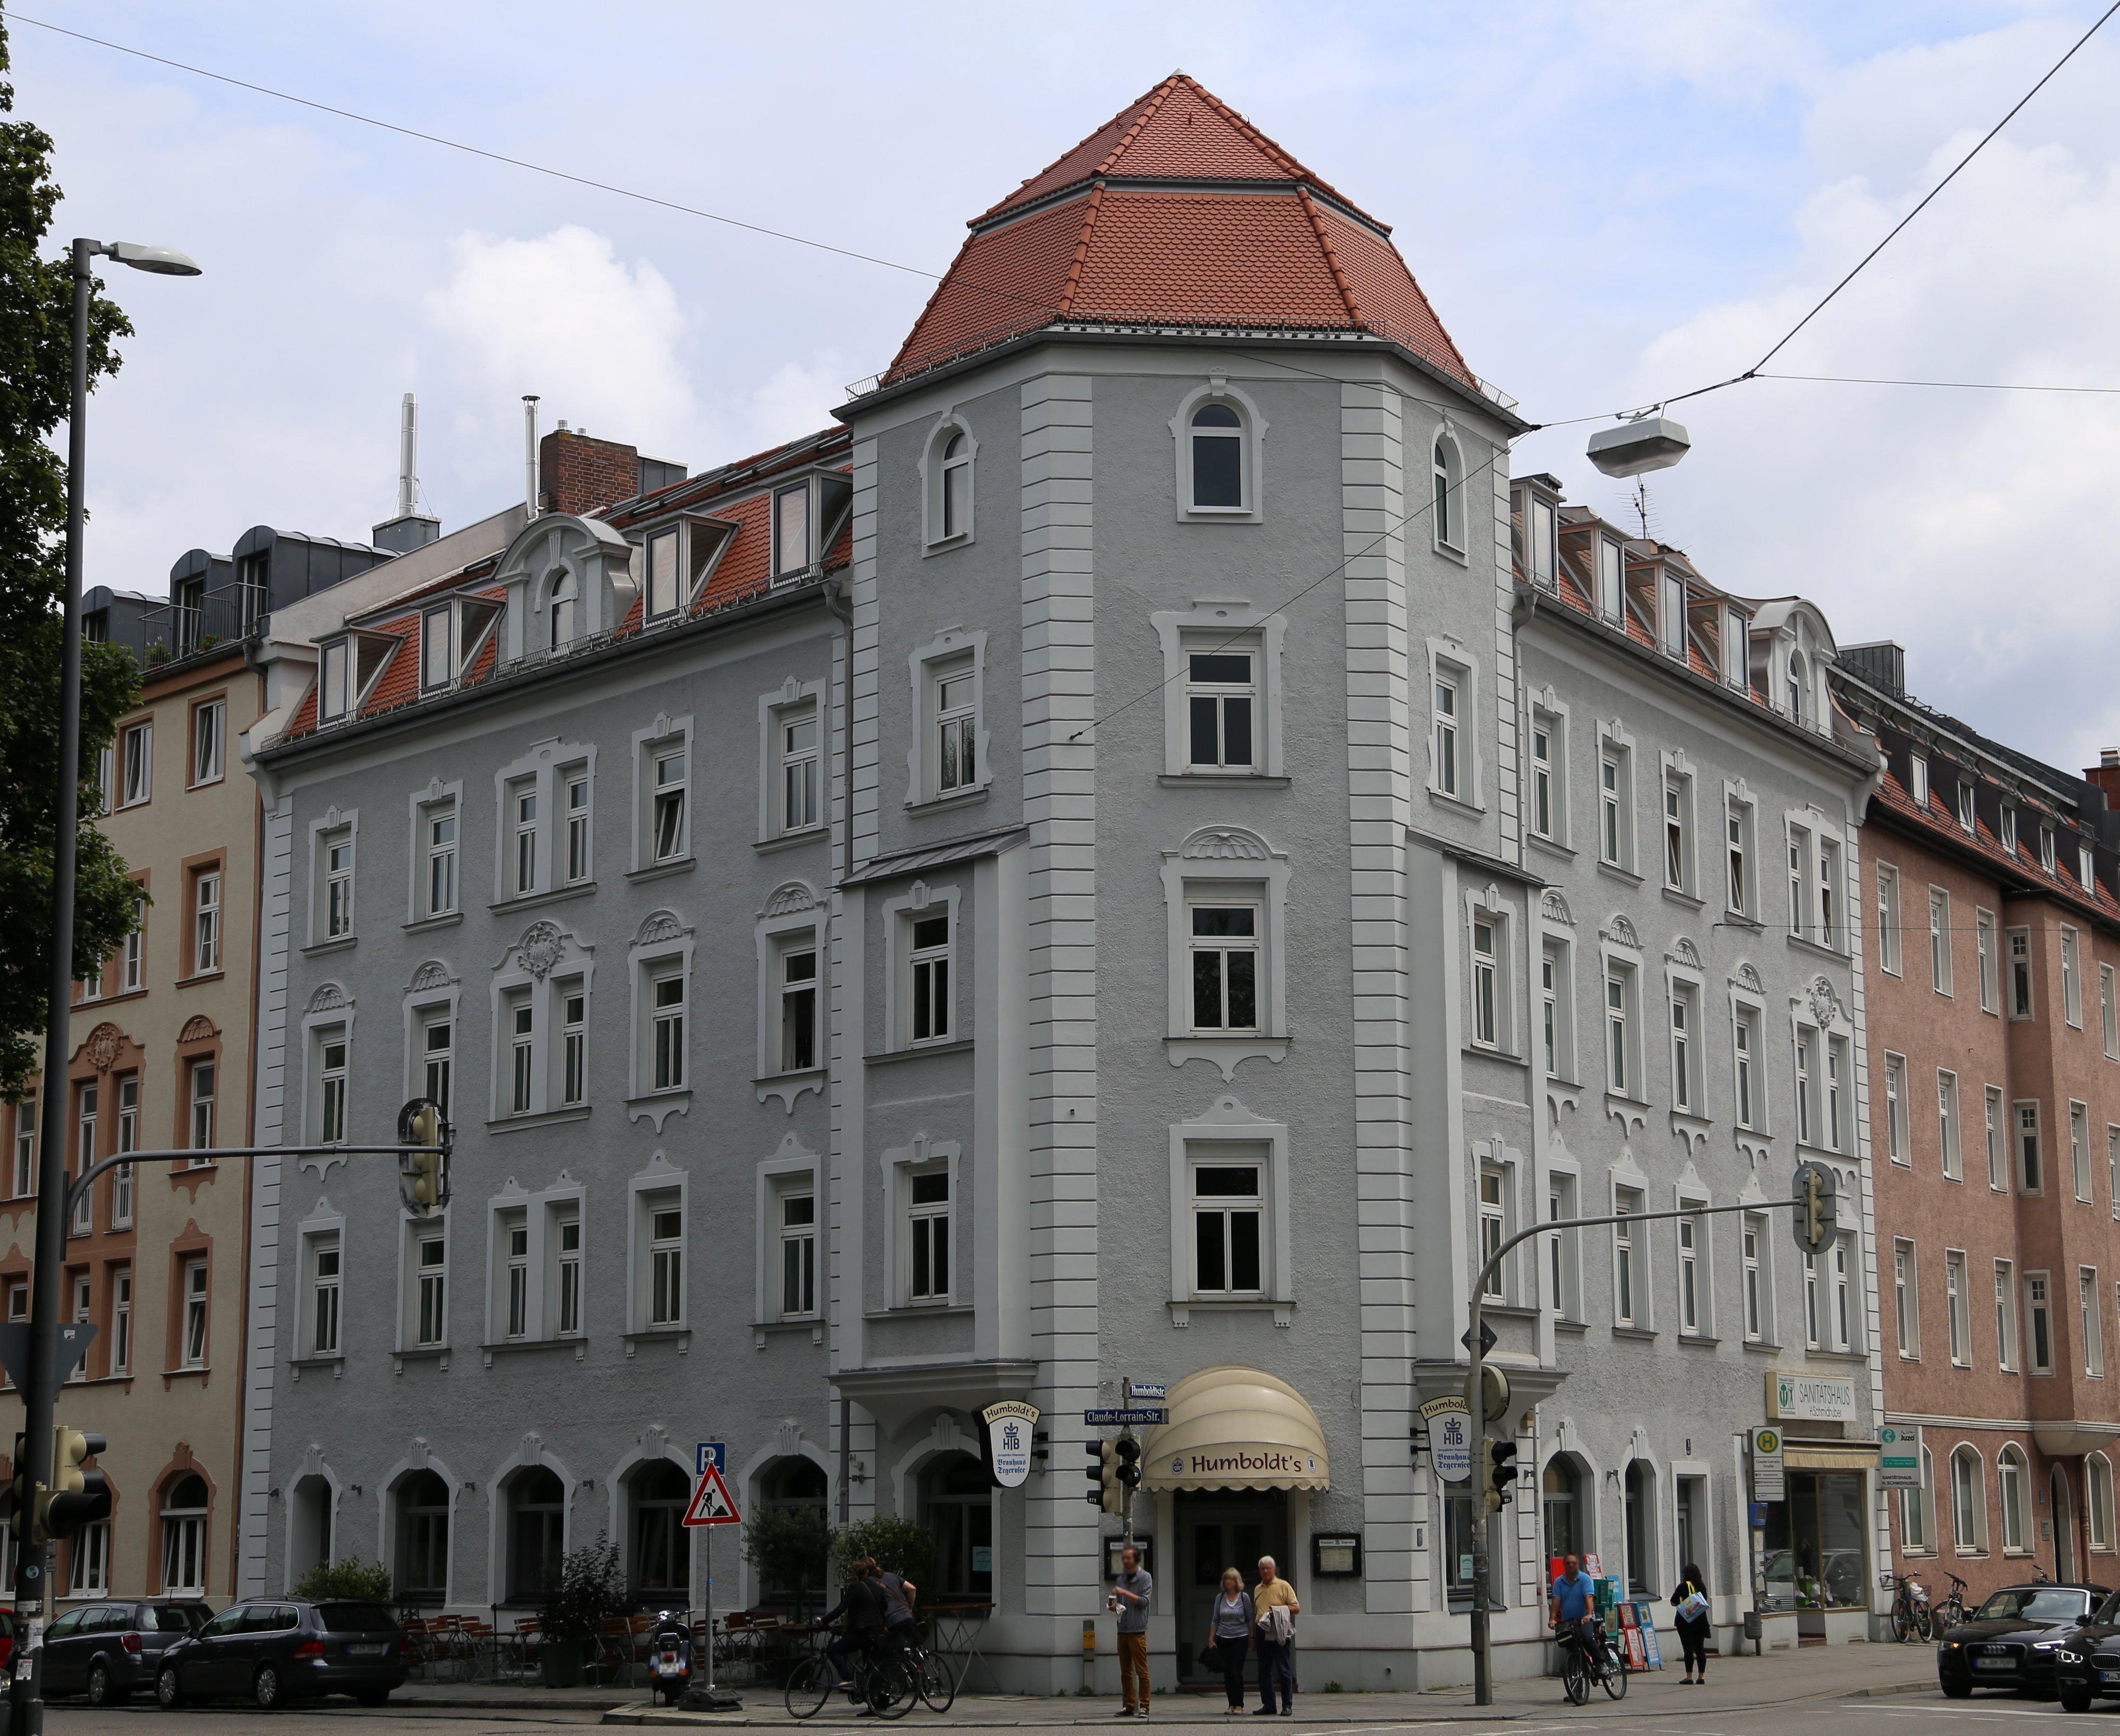 Humboldtstr München file humboldtstr 1 muenchen 1 jpg wikimedia commons